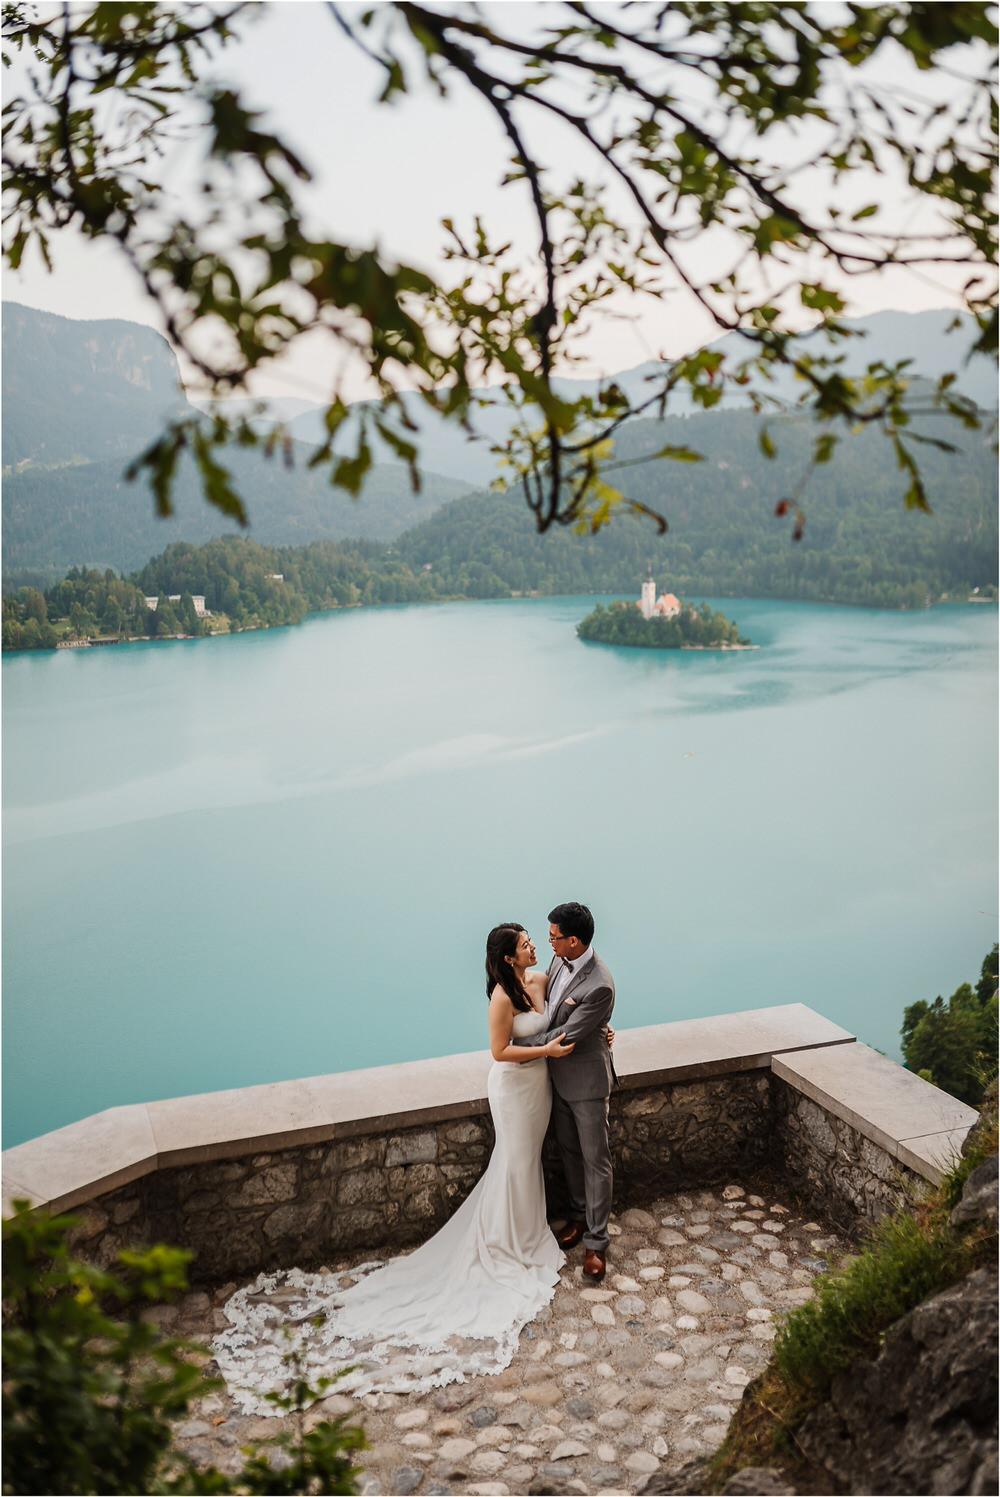 prewedding bled lake slovenia asian couple ljubljana engagement singapore love bohinj lake 0068.jpg